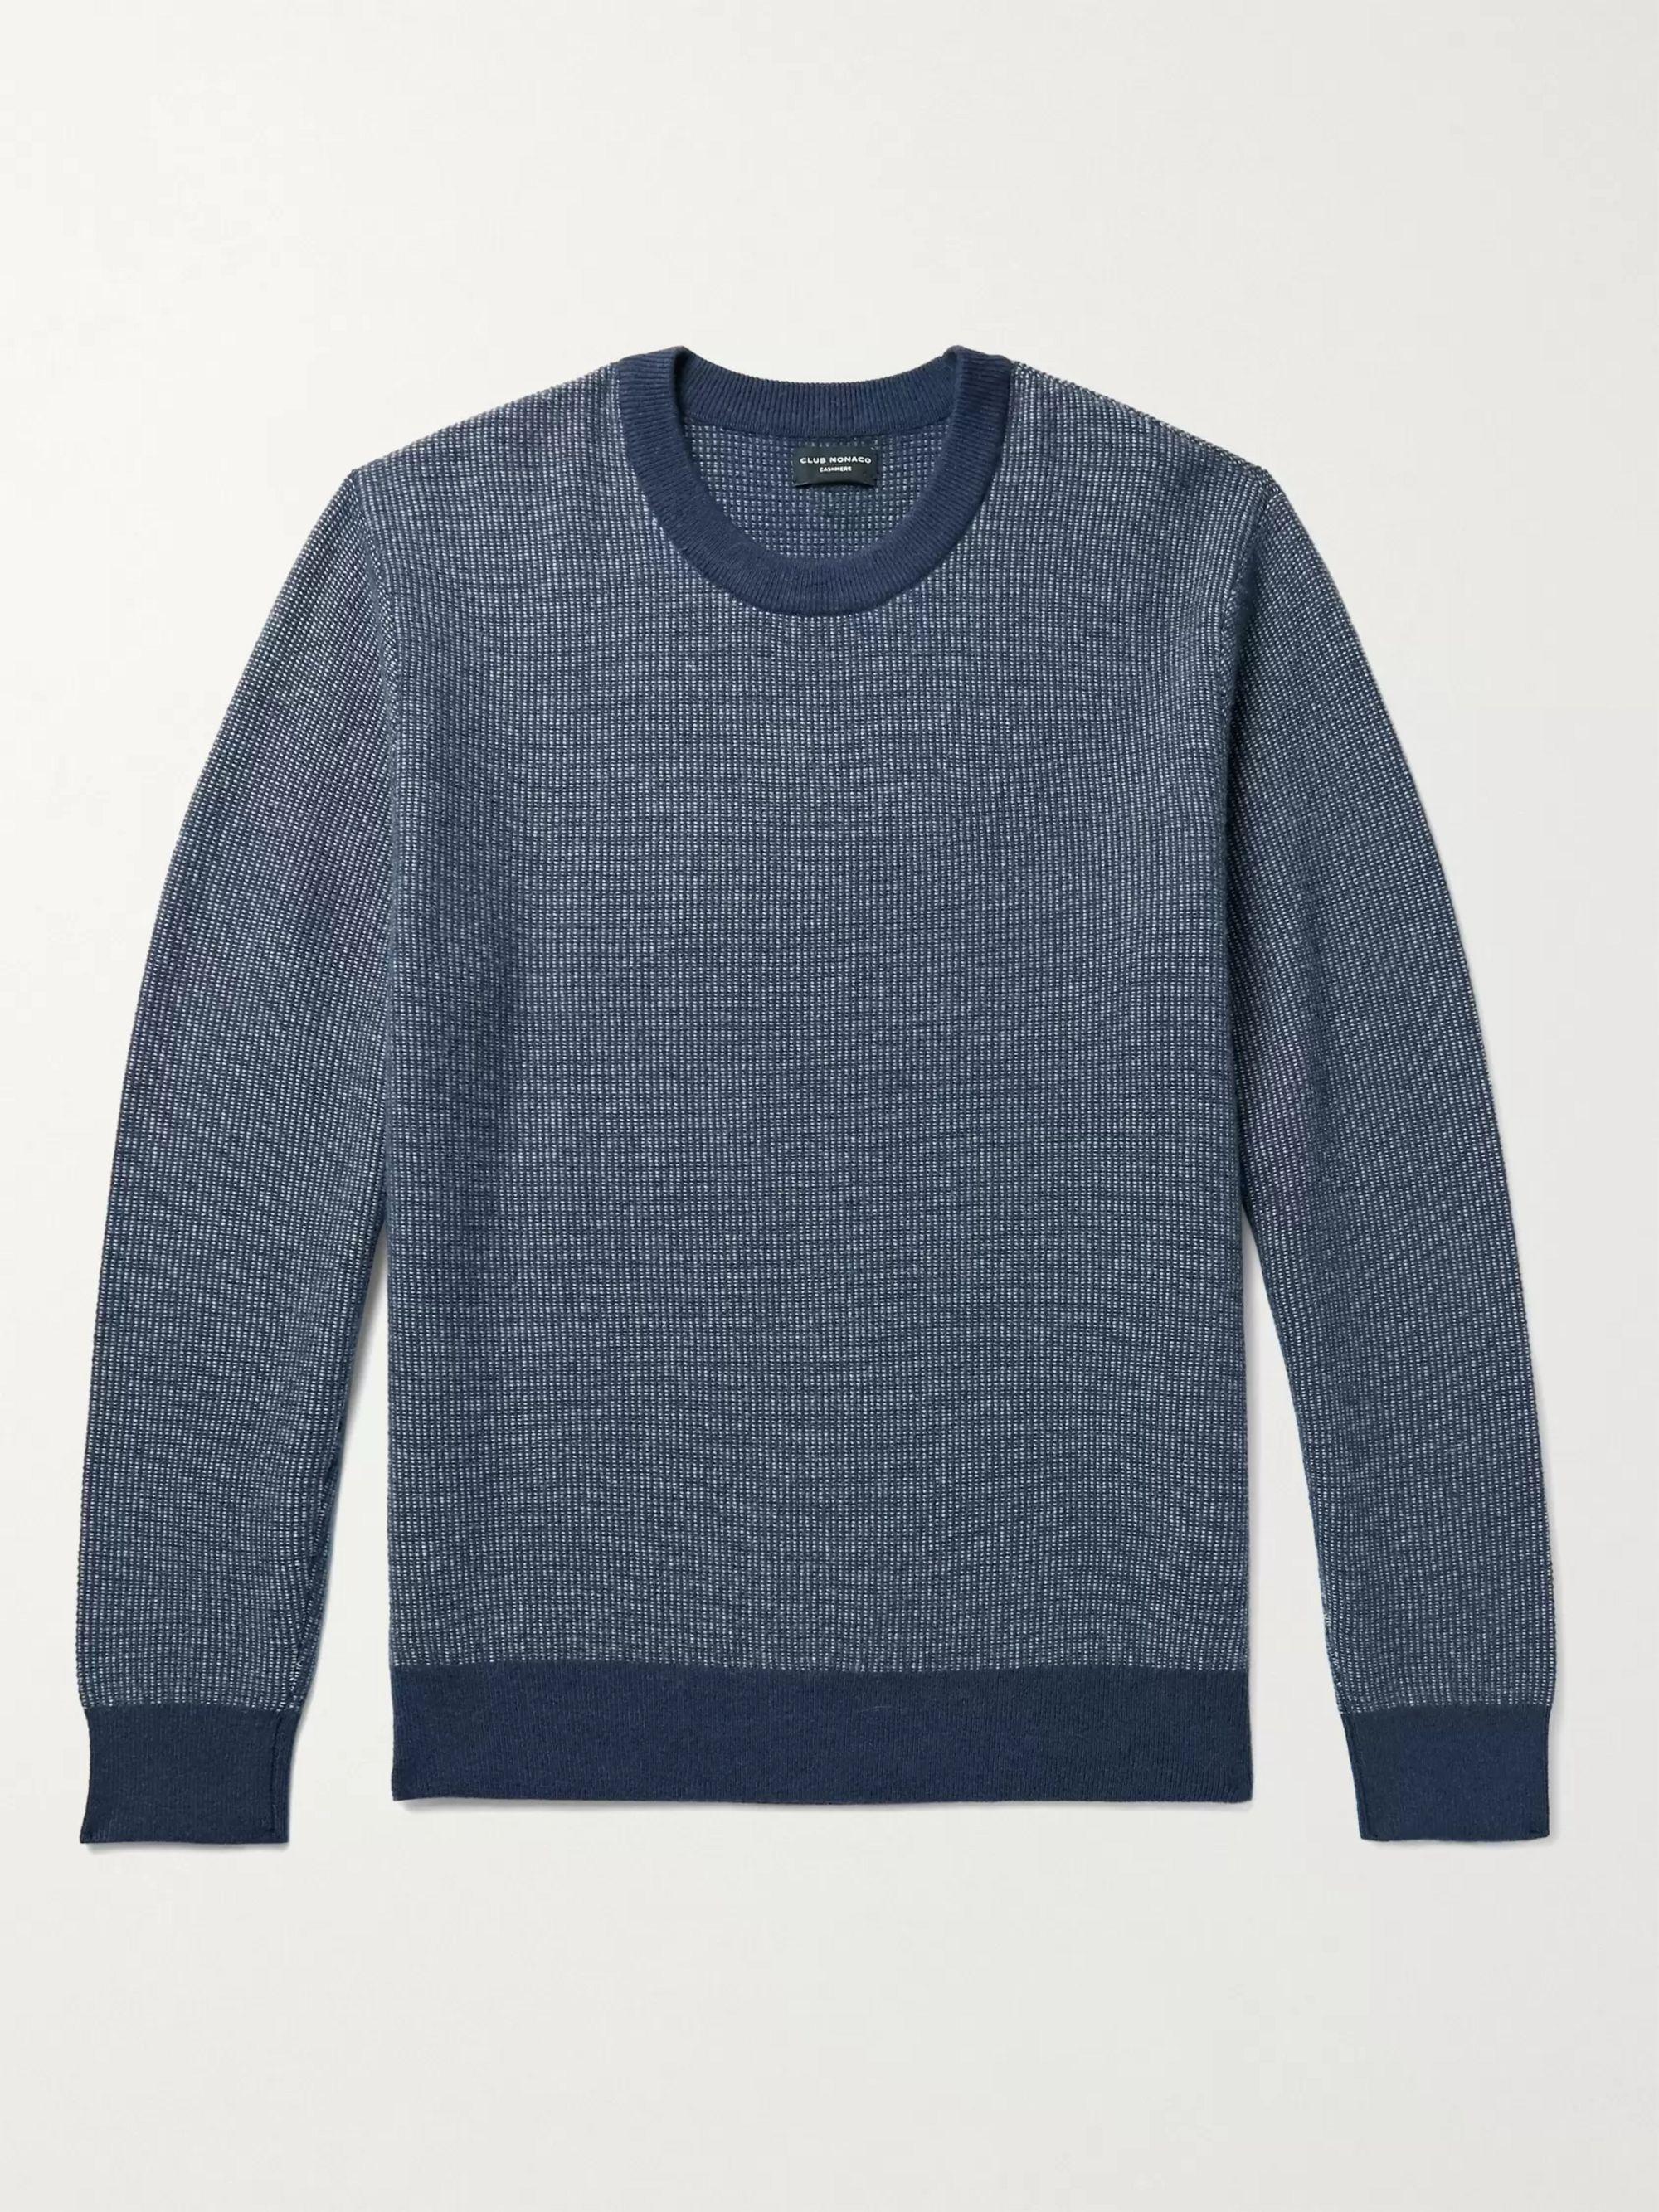 CLUB MONACO Cashmere Jacquard Sweater